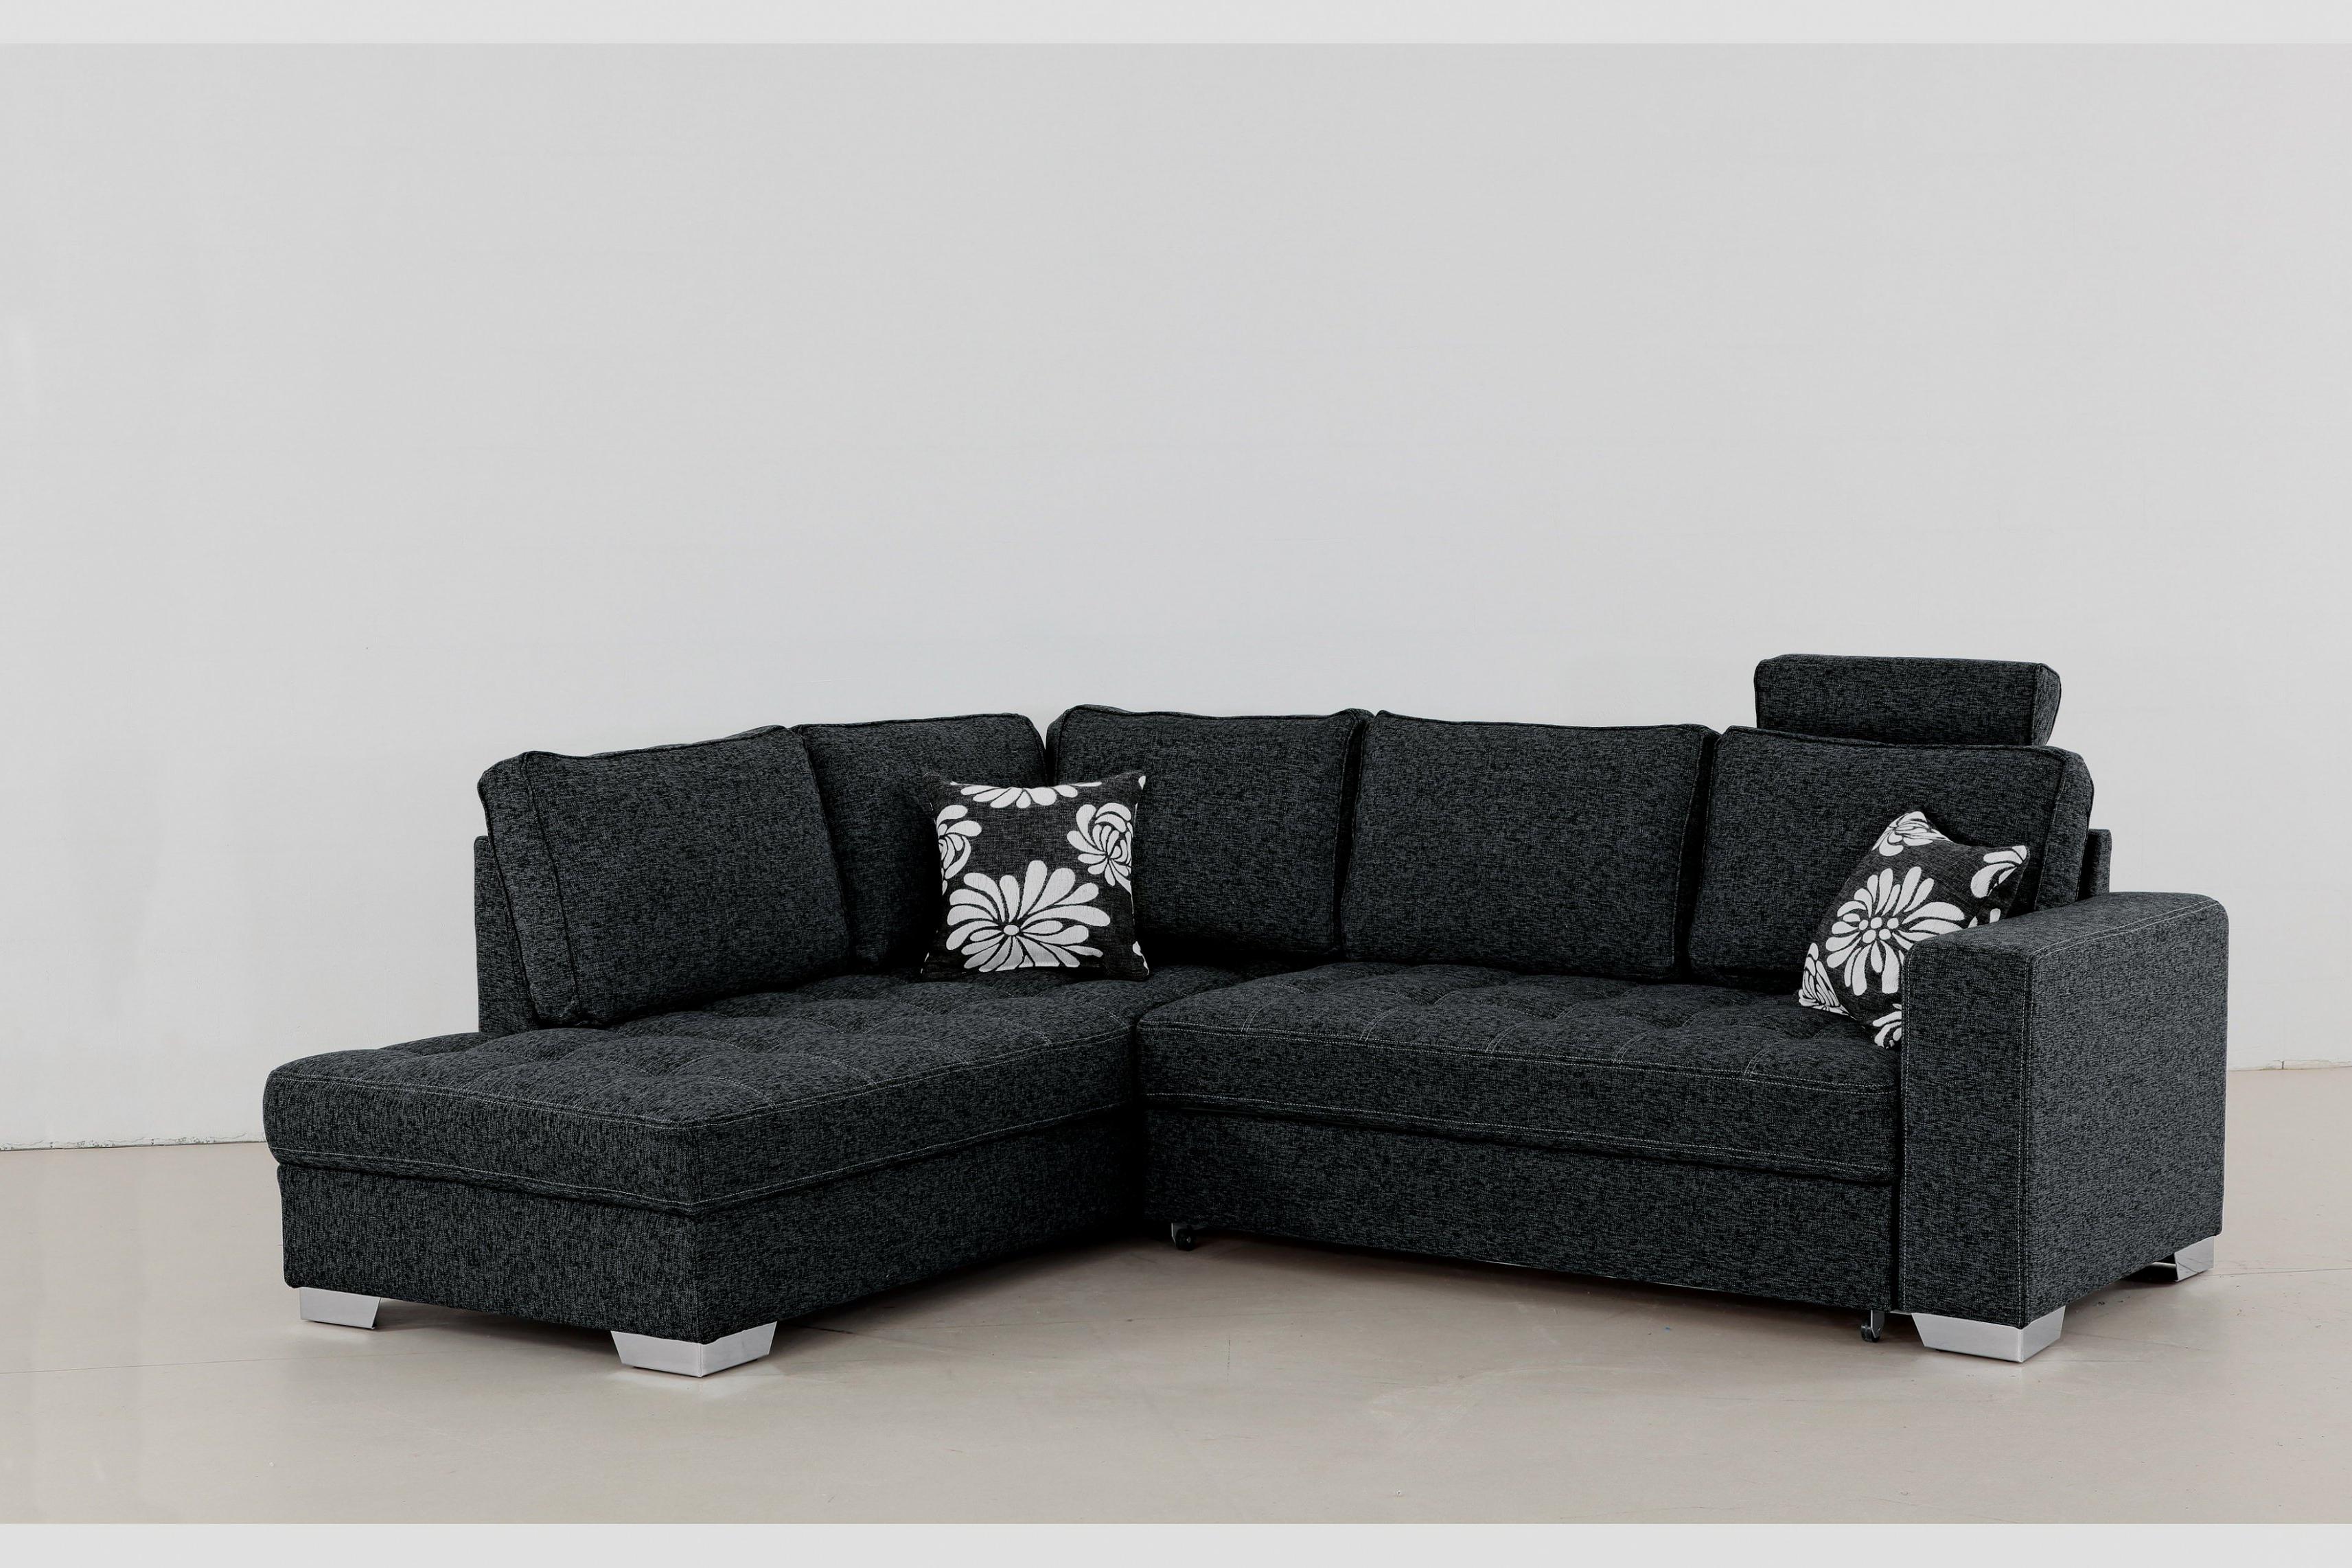 Sofas Chaise Longue Baratos Modernos D0dg sofas Chaise Longue Baratos Modernos Vaste sofa Chaise Longue Ikea